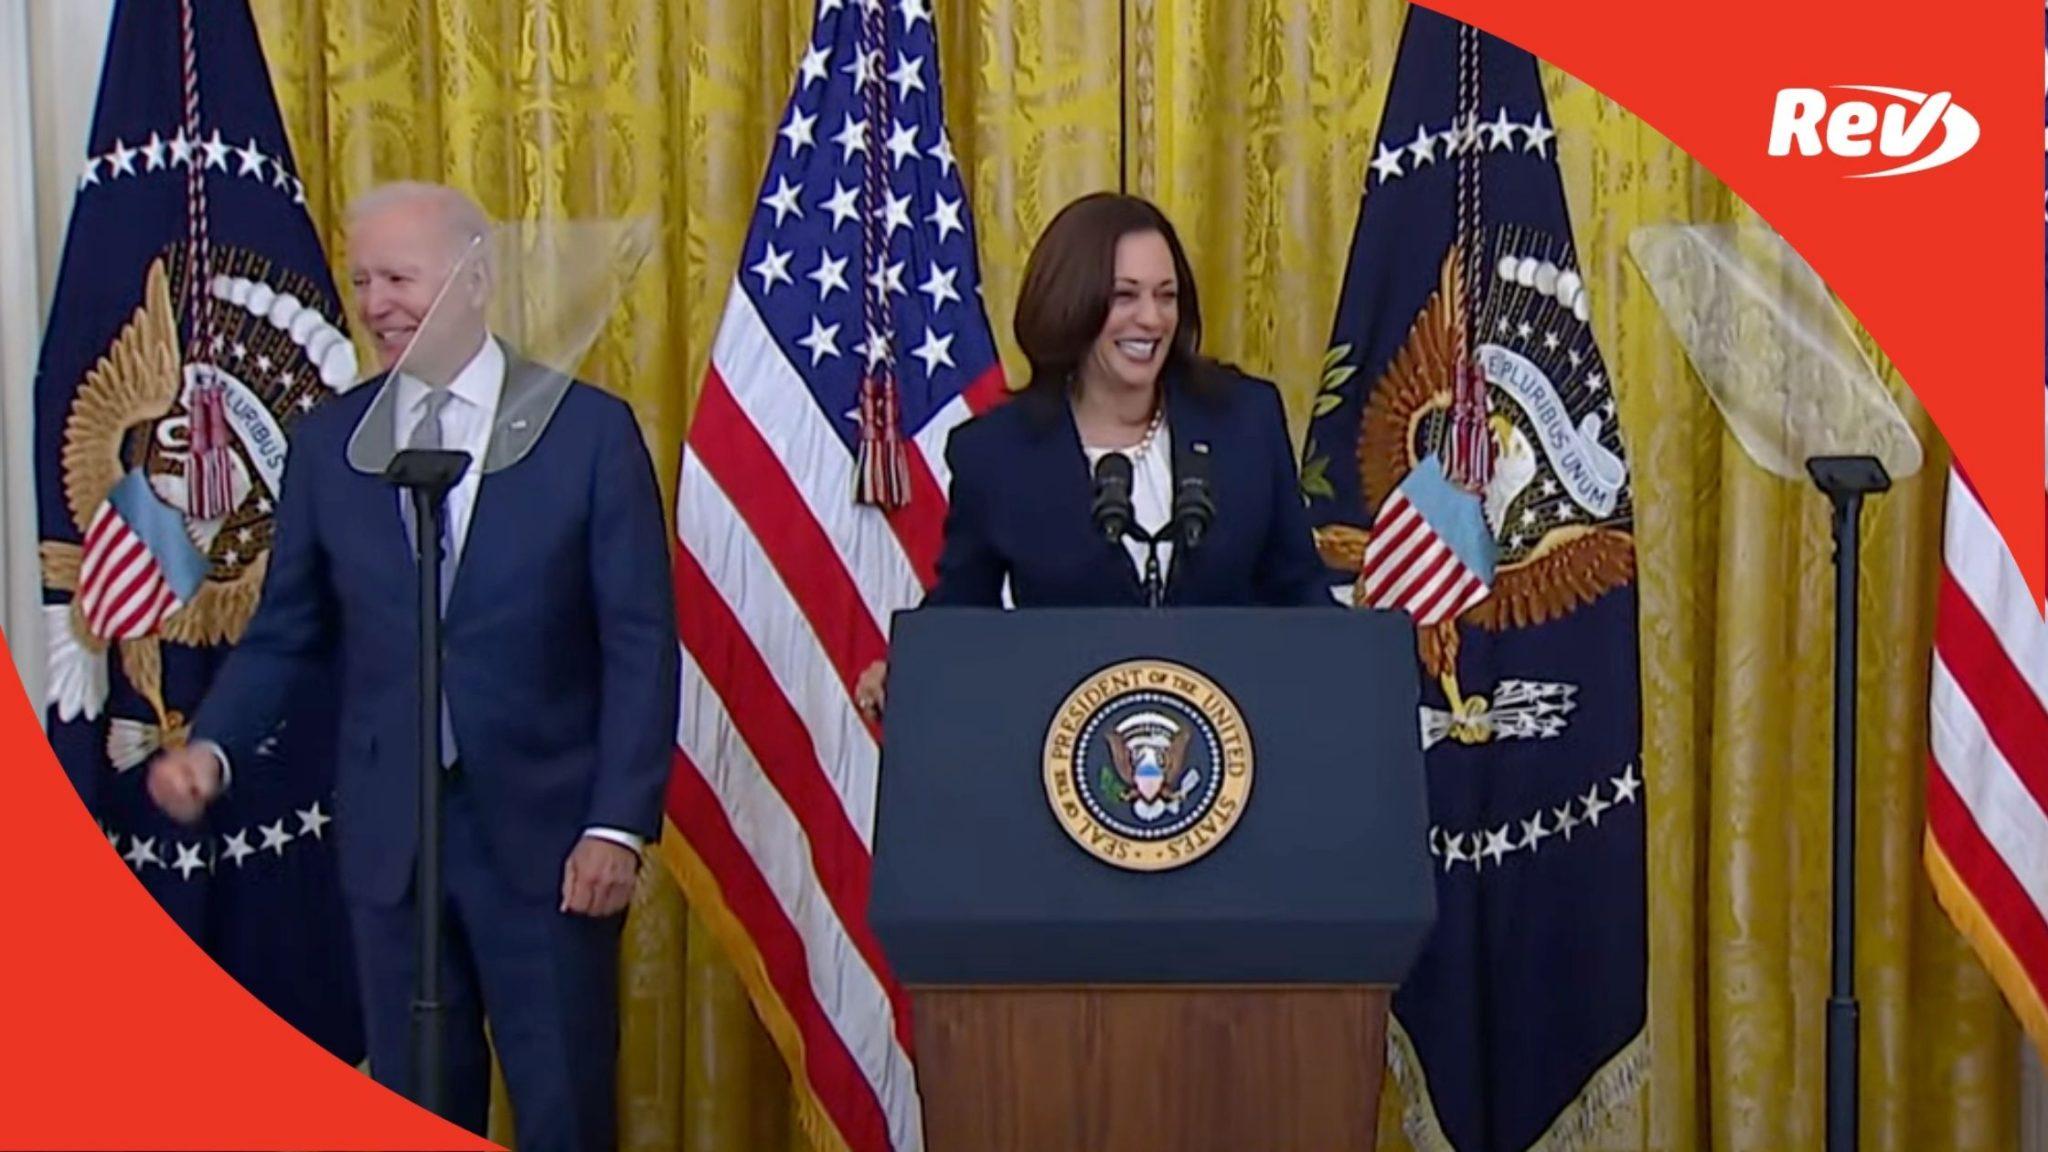 Joe Biden & Kamala Harris Press Conference Juneteenth